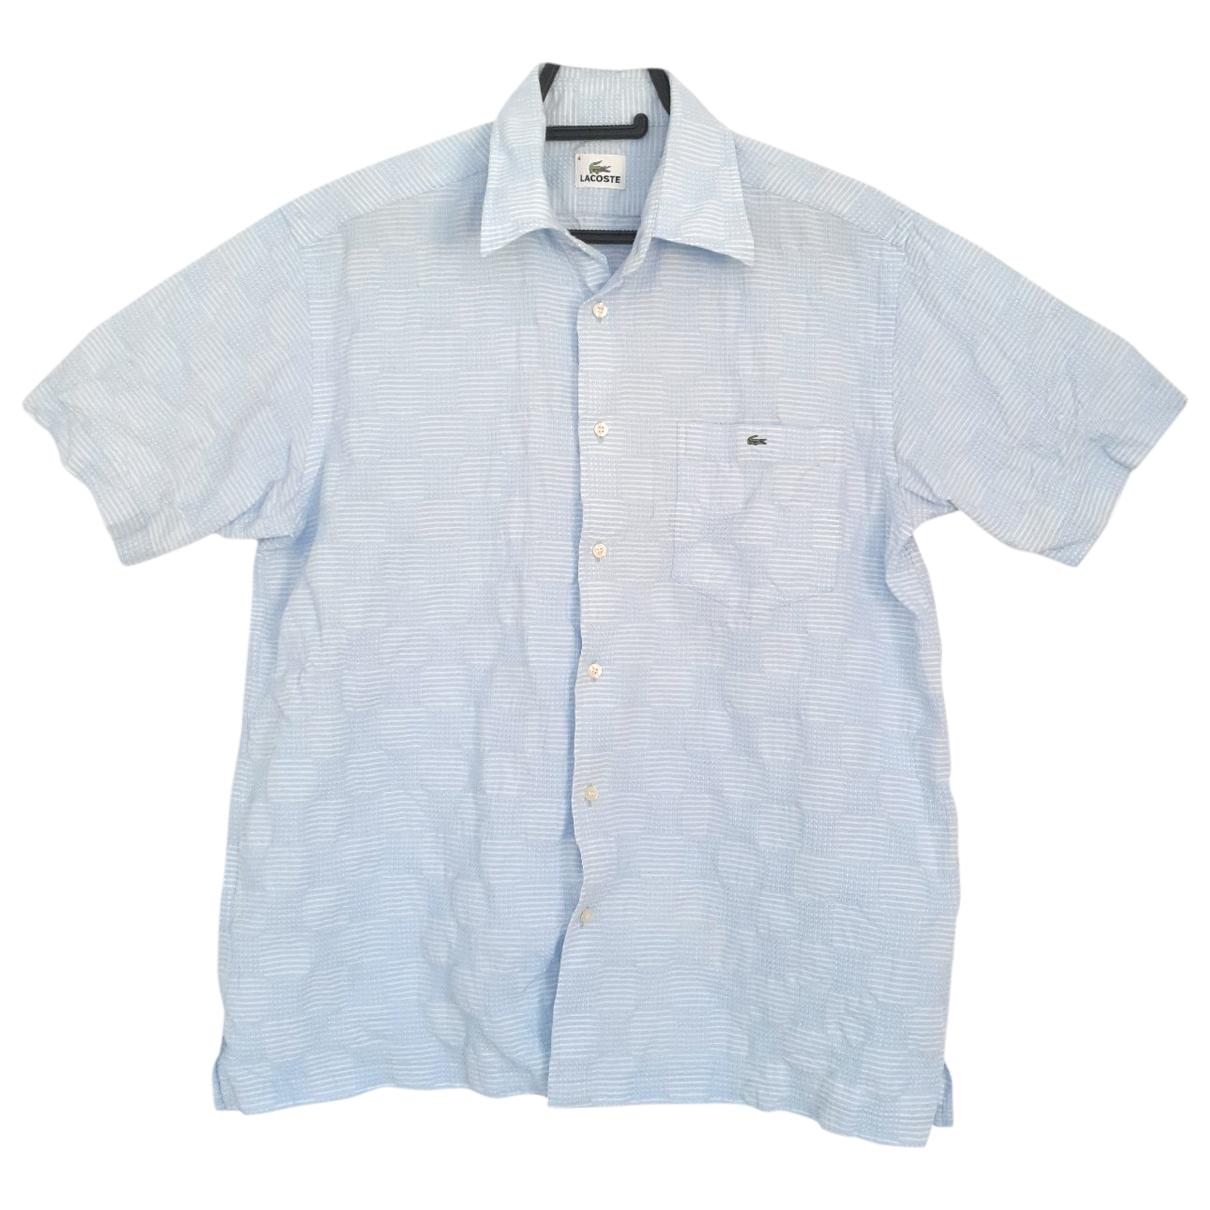 Lacoste \N Blue Cotton Shirts for Men M International